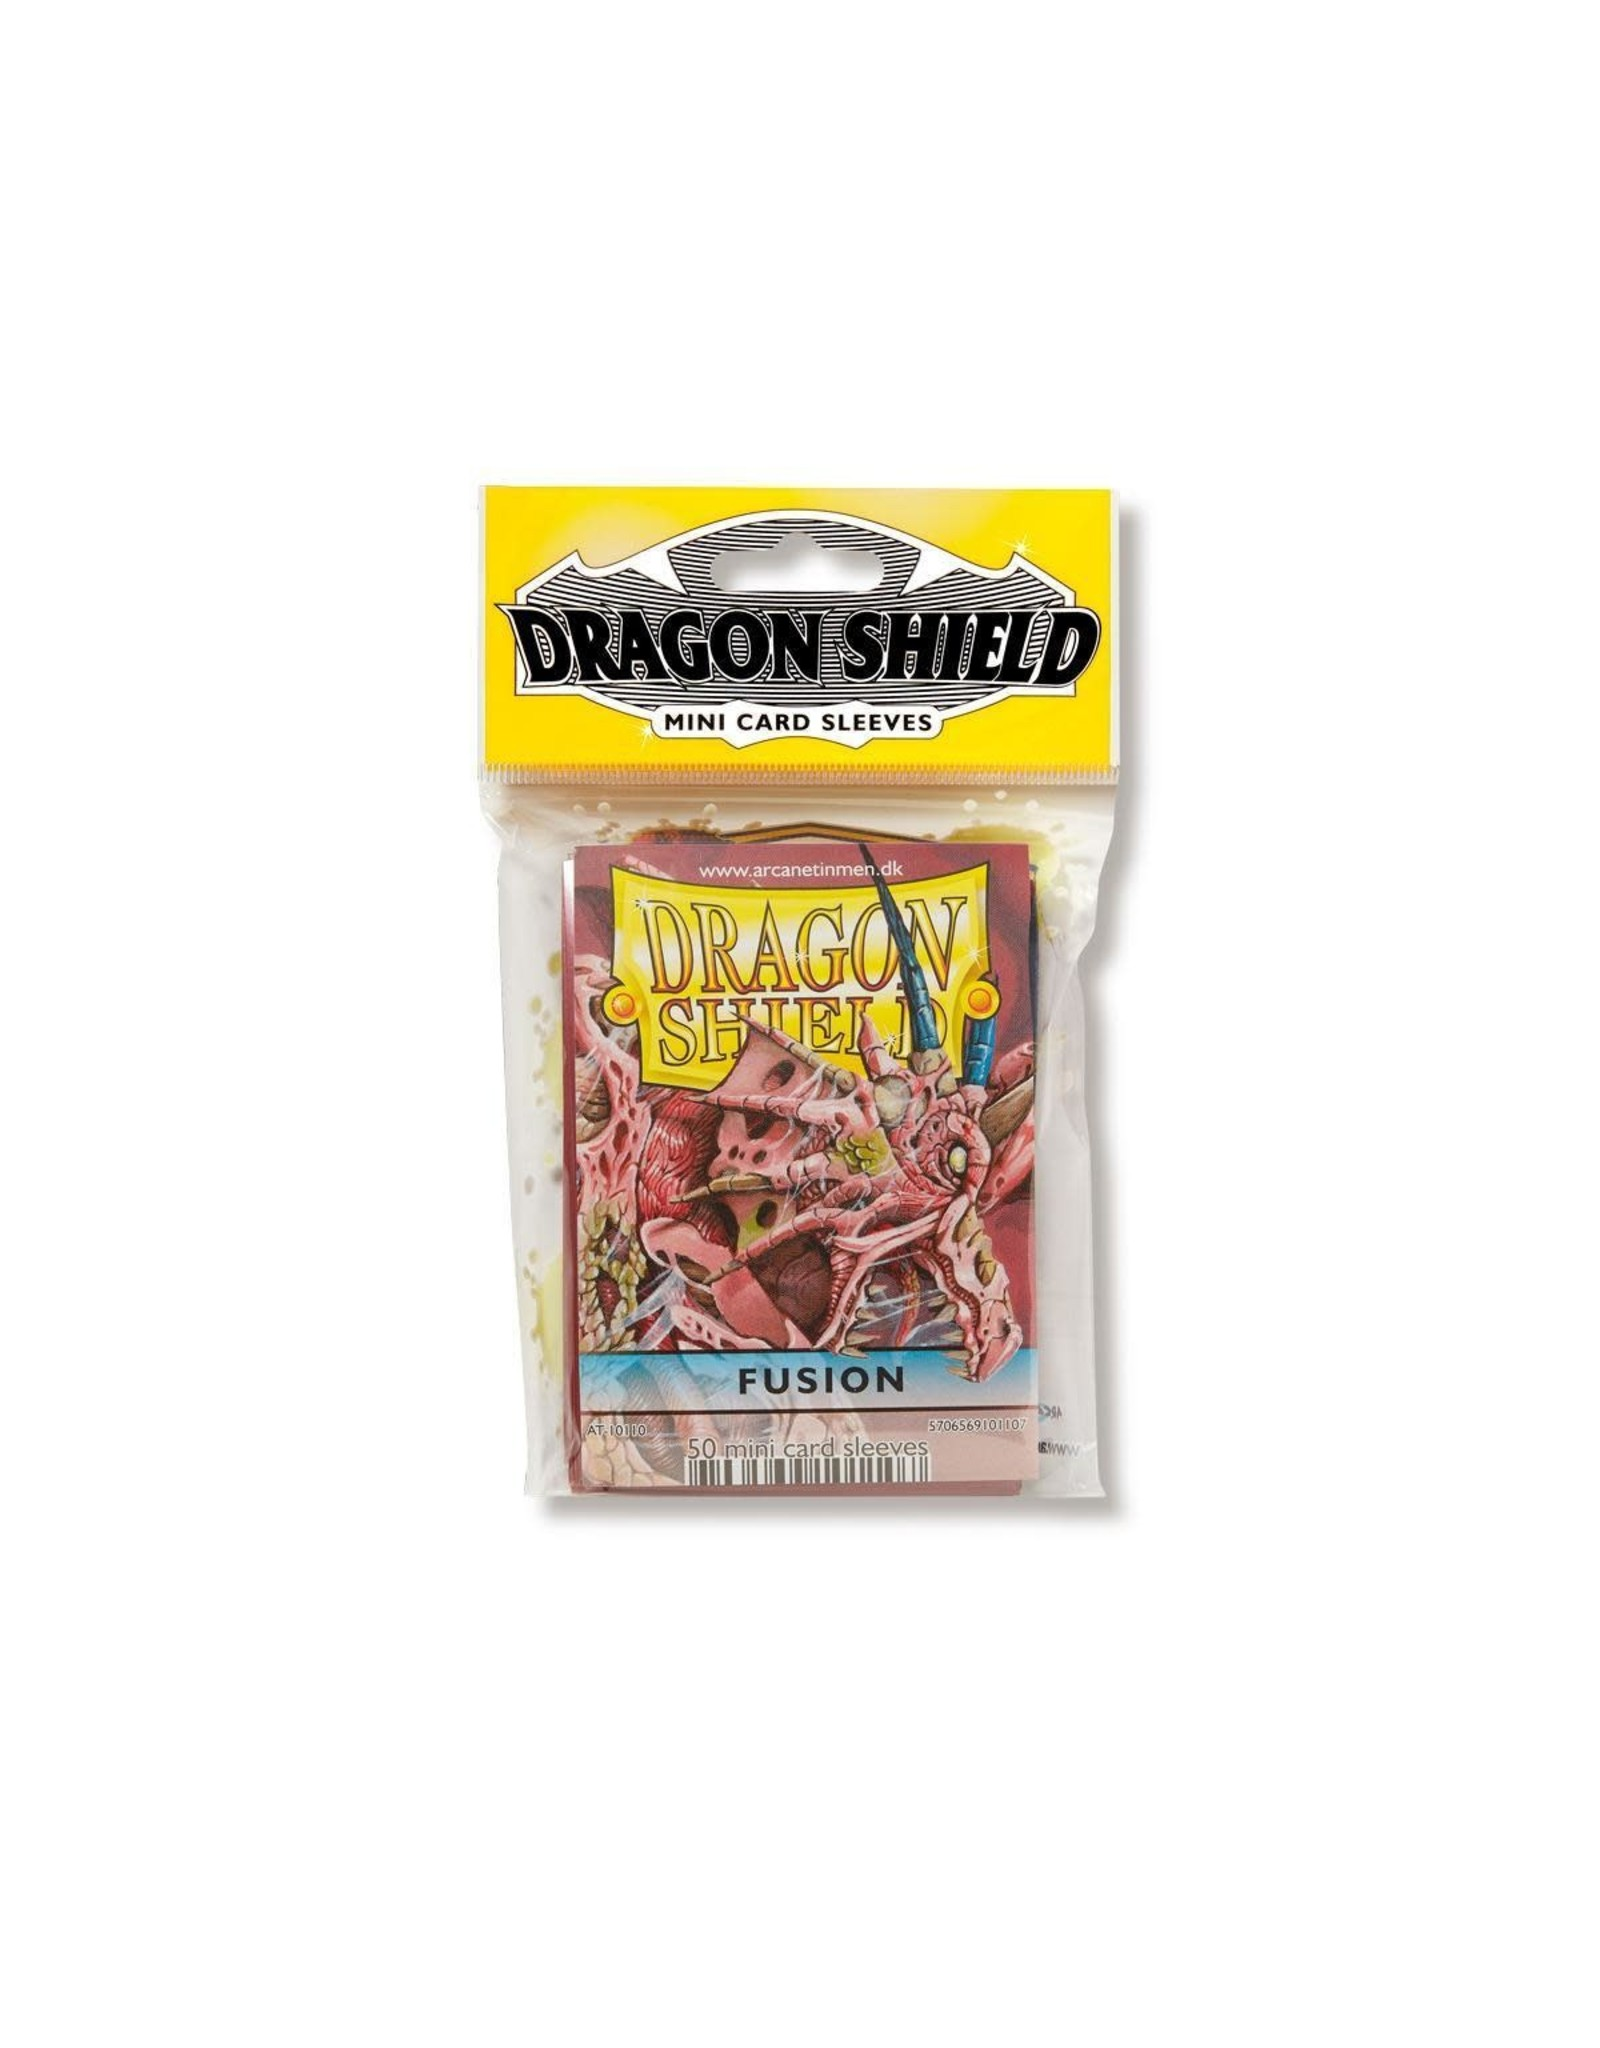 Dragon Shield Mini Sleeves - Fusion (50 ct. in bag)